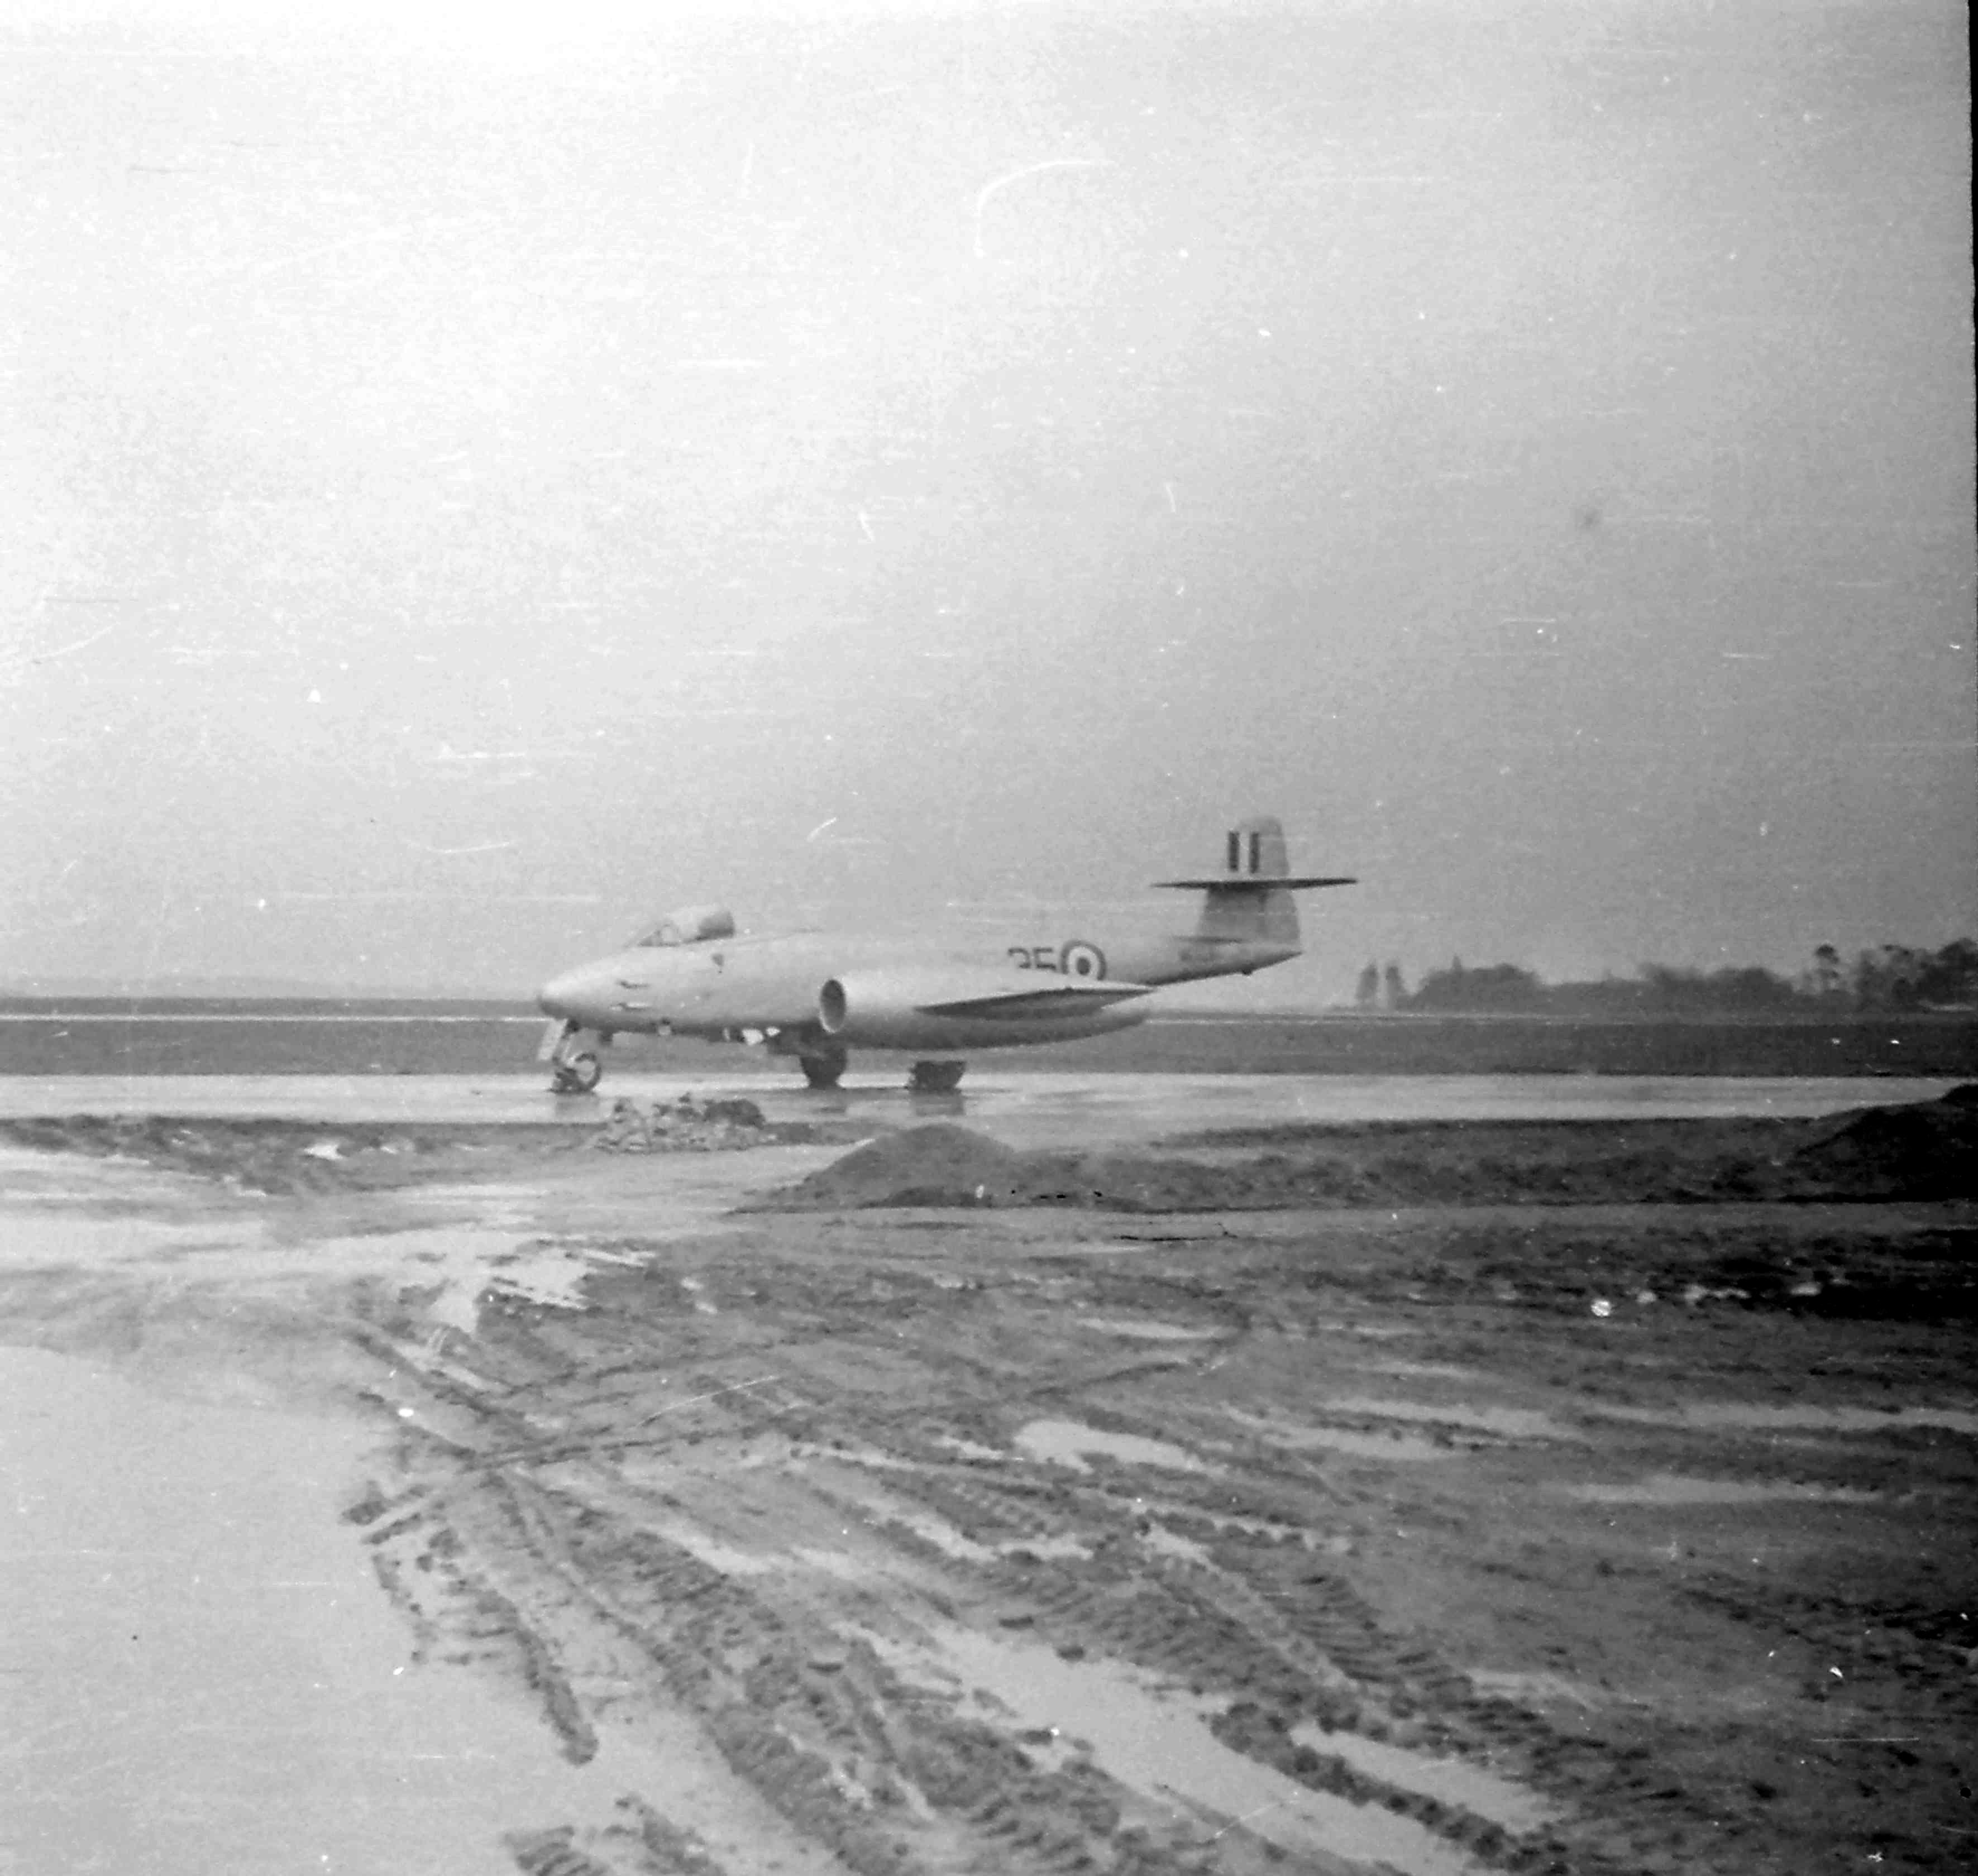 RAF Worksop, Meteor, F.8, 35, 1952